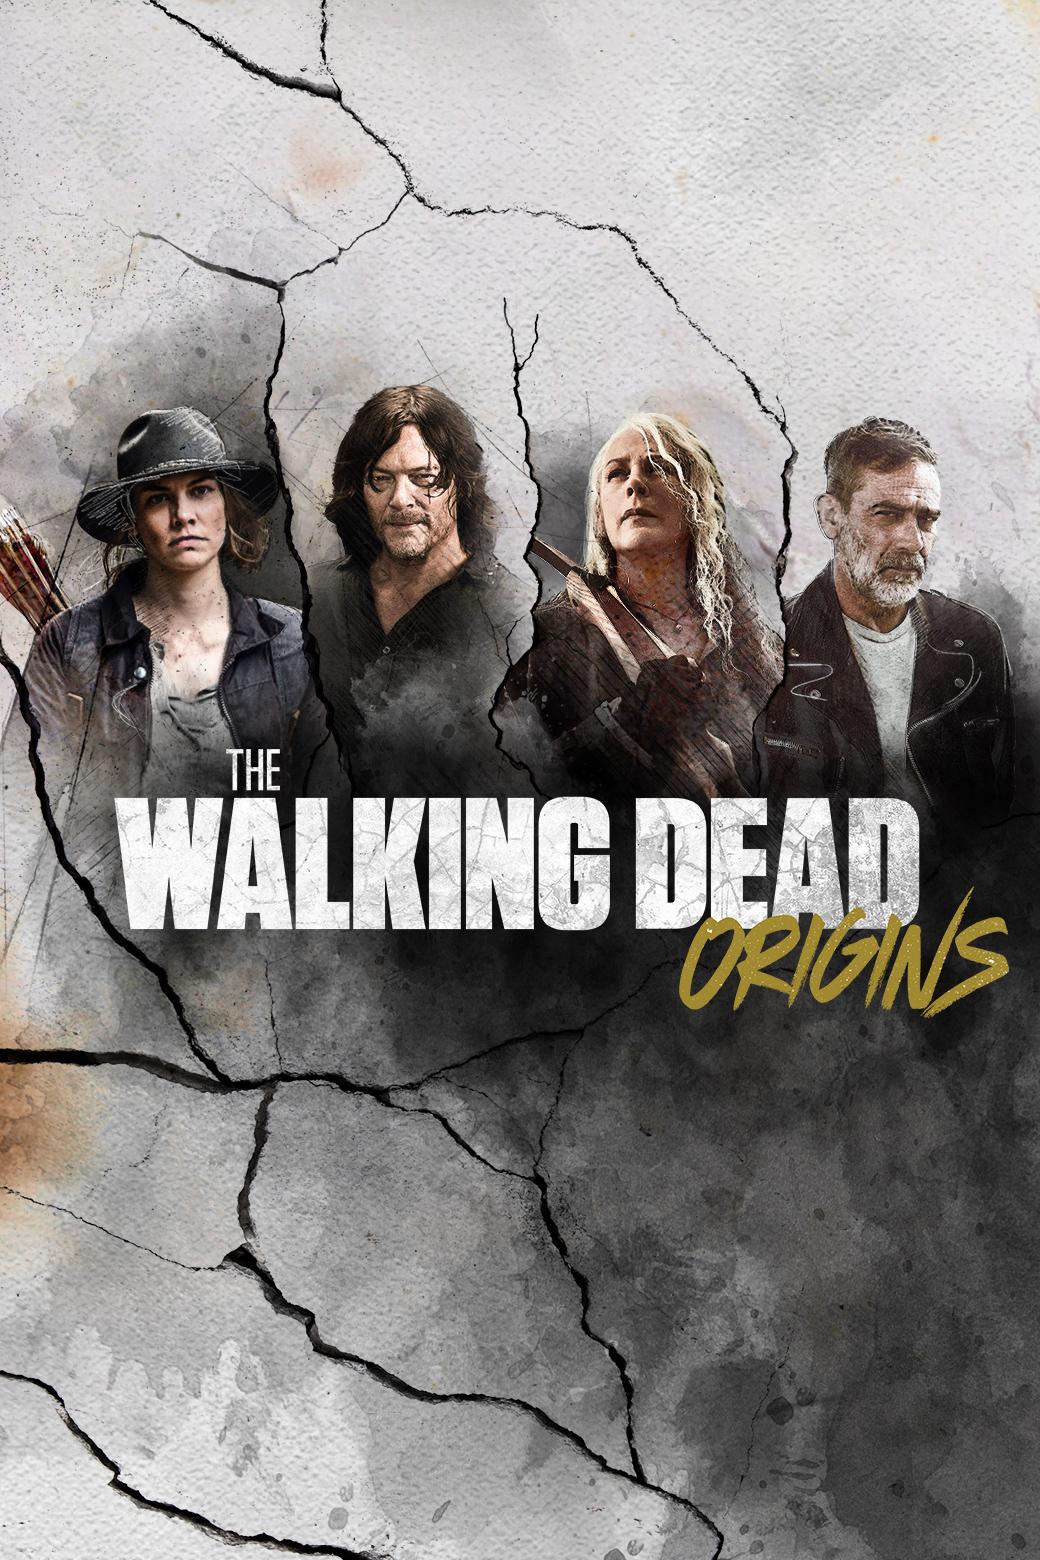 series_tms_SH039028740000_walking-dead-origins__img_poster_2x3